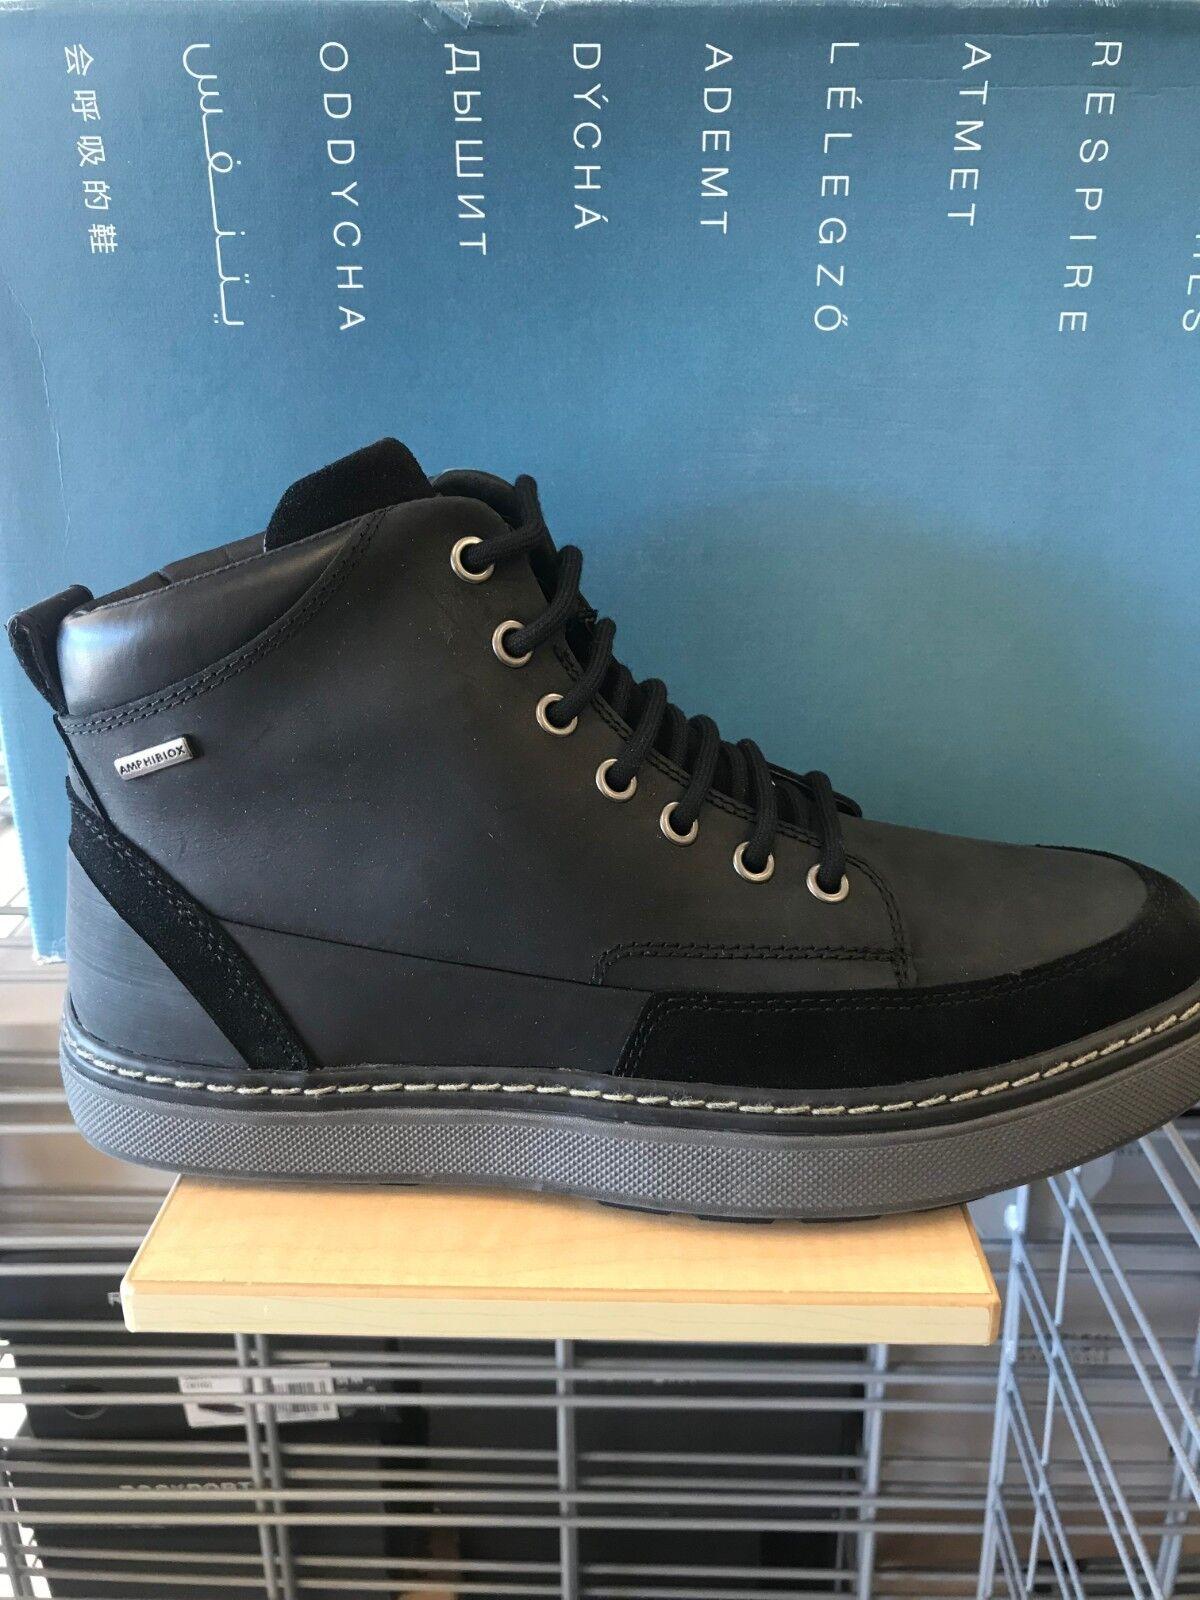 Metropolitano Persona a cargo del juego deportivo Retirarse  Geox U Mattias B ABX Amphibiox Ankle Boots Lace Up Fashion Sneakers Shoes  Black for sale online